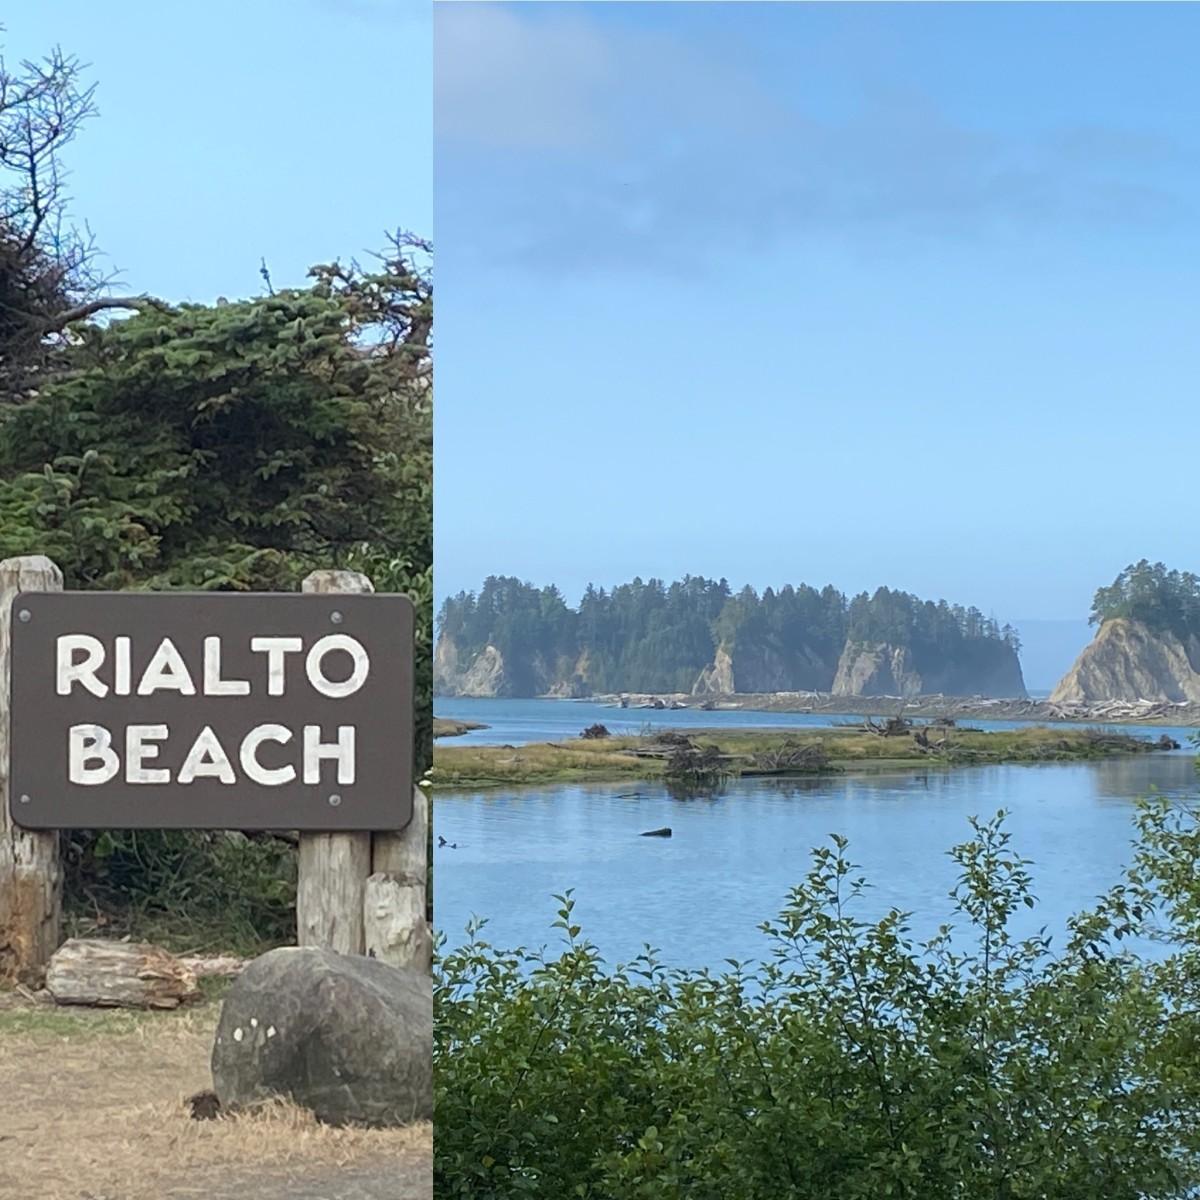 My Summertime Destination: Rialto Beach at the Olympic Peninsula